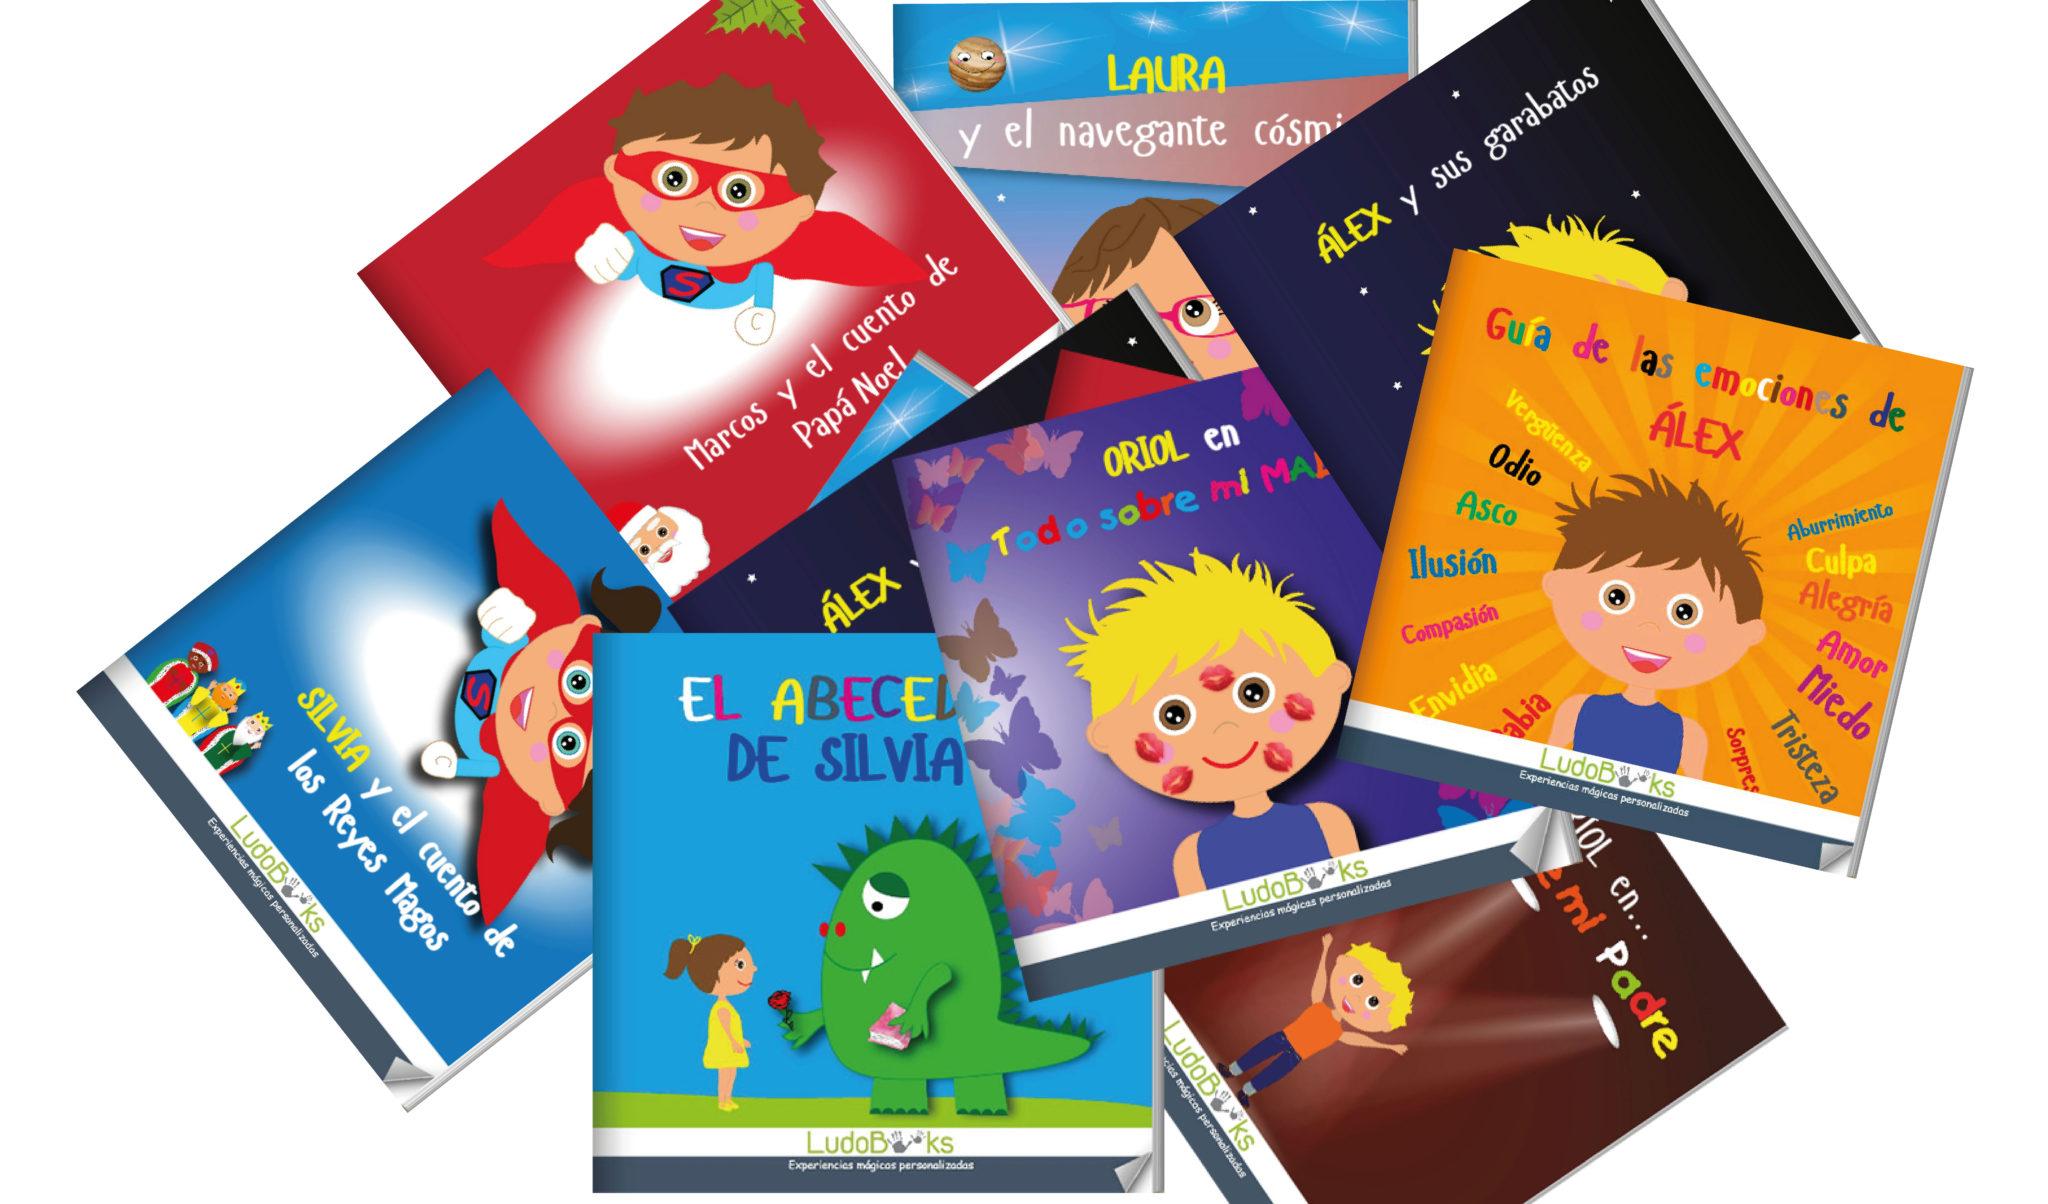 ideas para aniversario - libros personalizados ludobooks